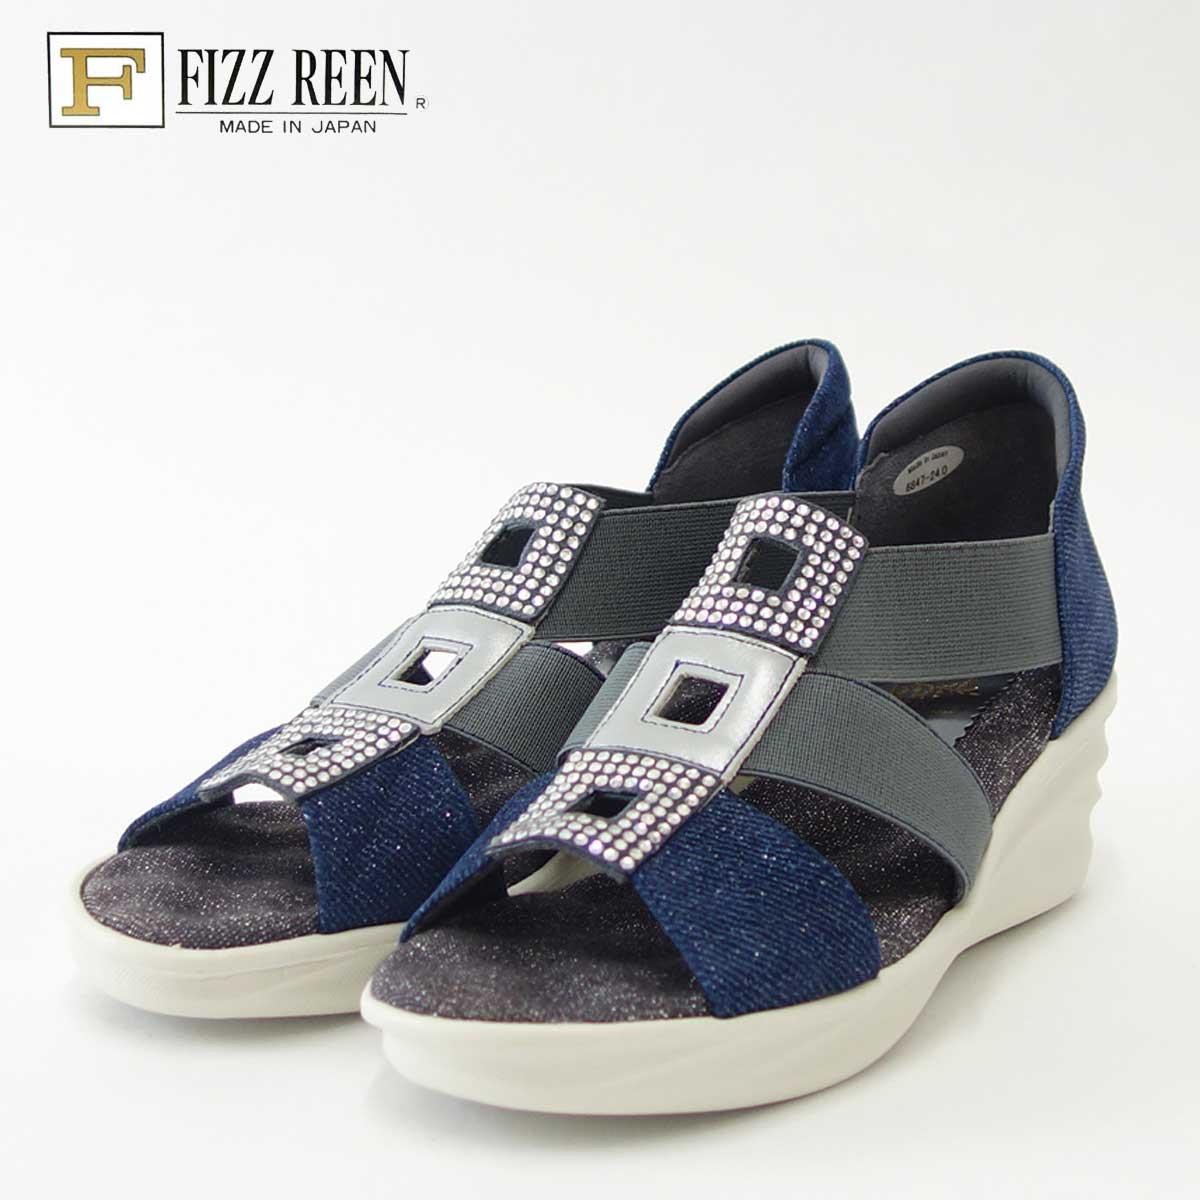 FIZZ REEN フィズリーン 6847 ネイビーお洒落な厚底ウェッジサンダルEEE幅のコンフォートサンダル「靴」